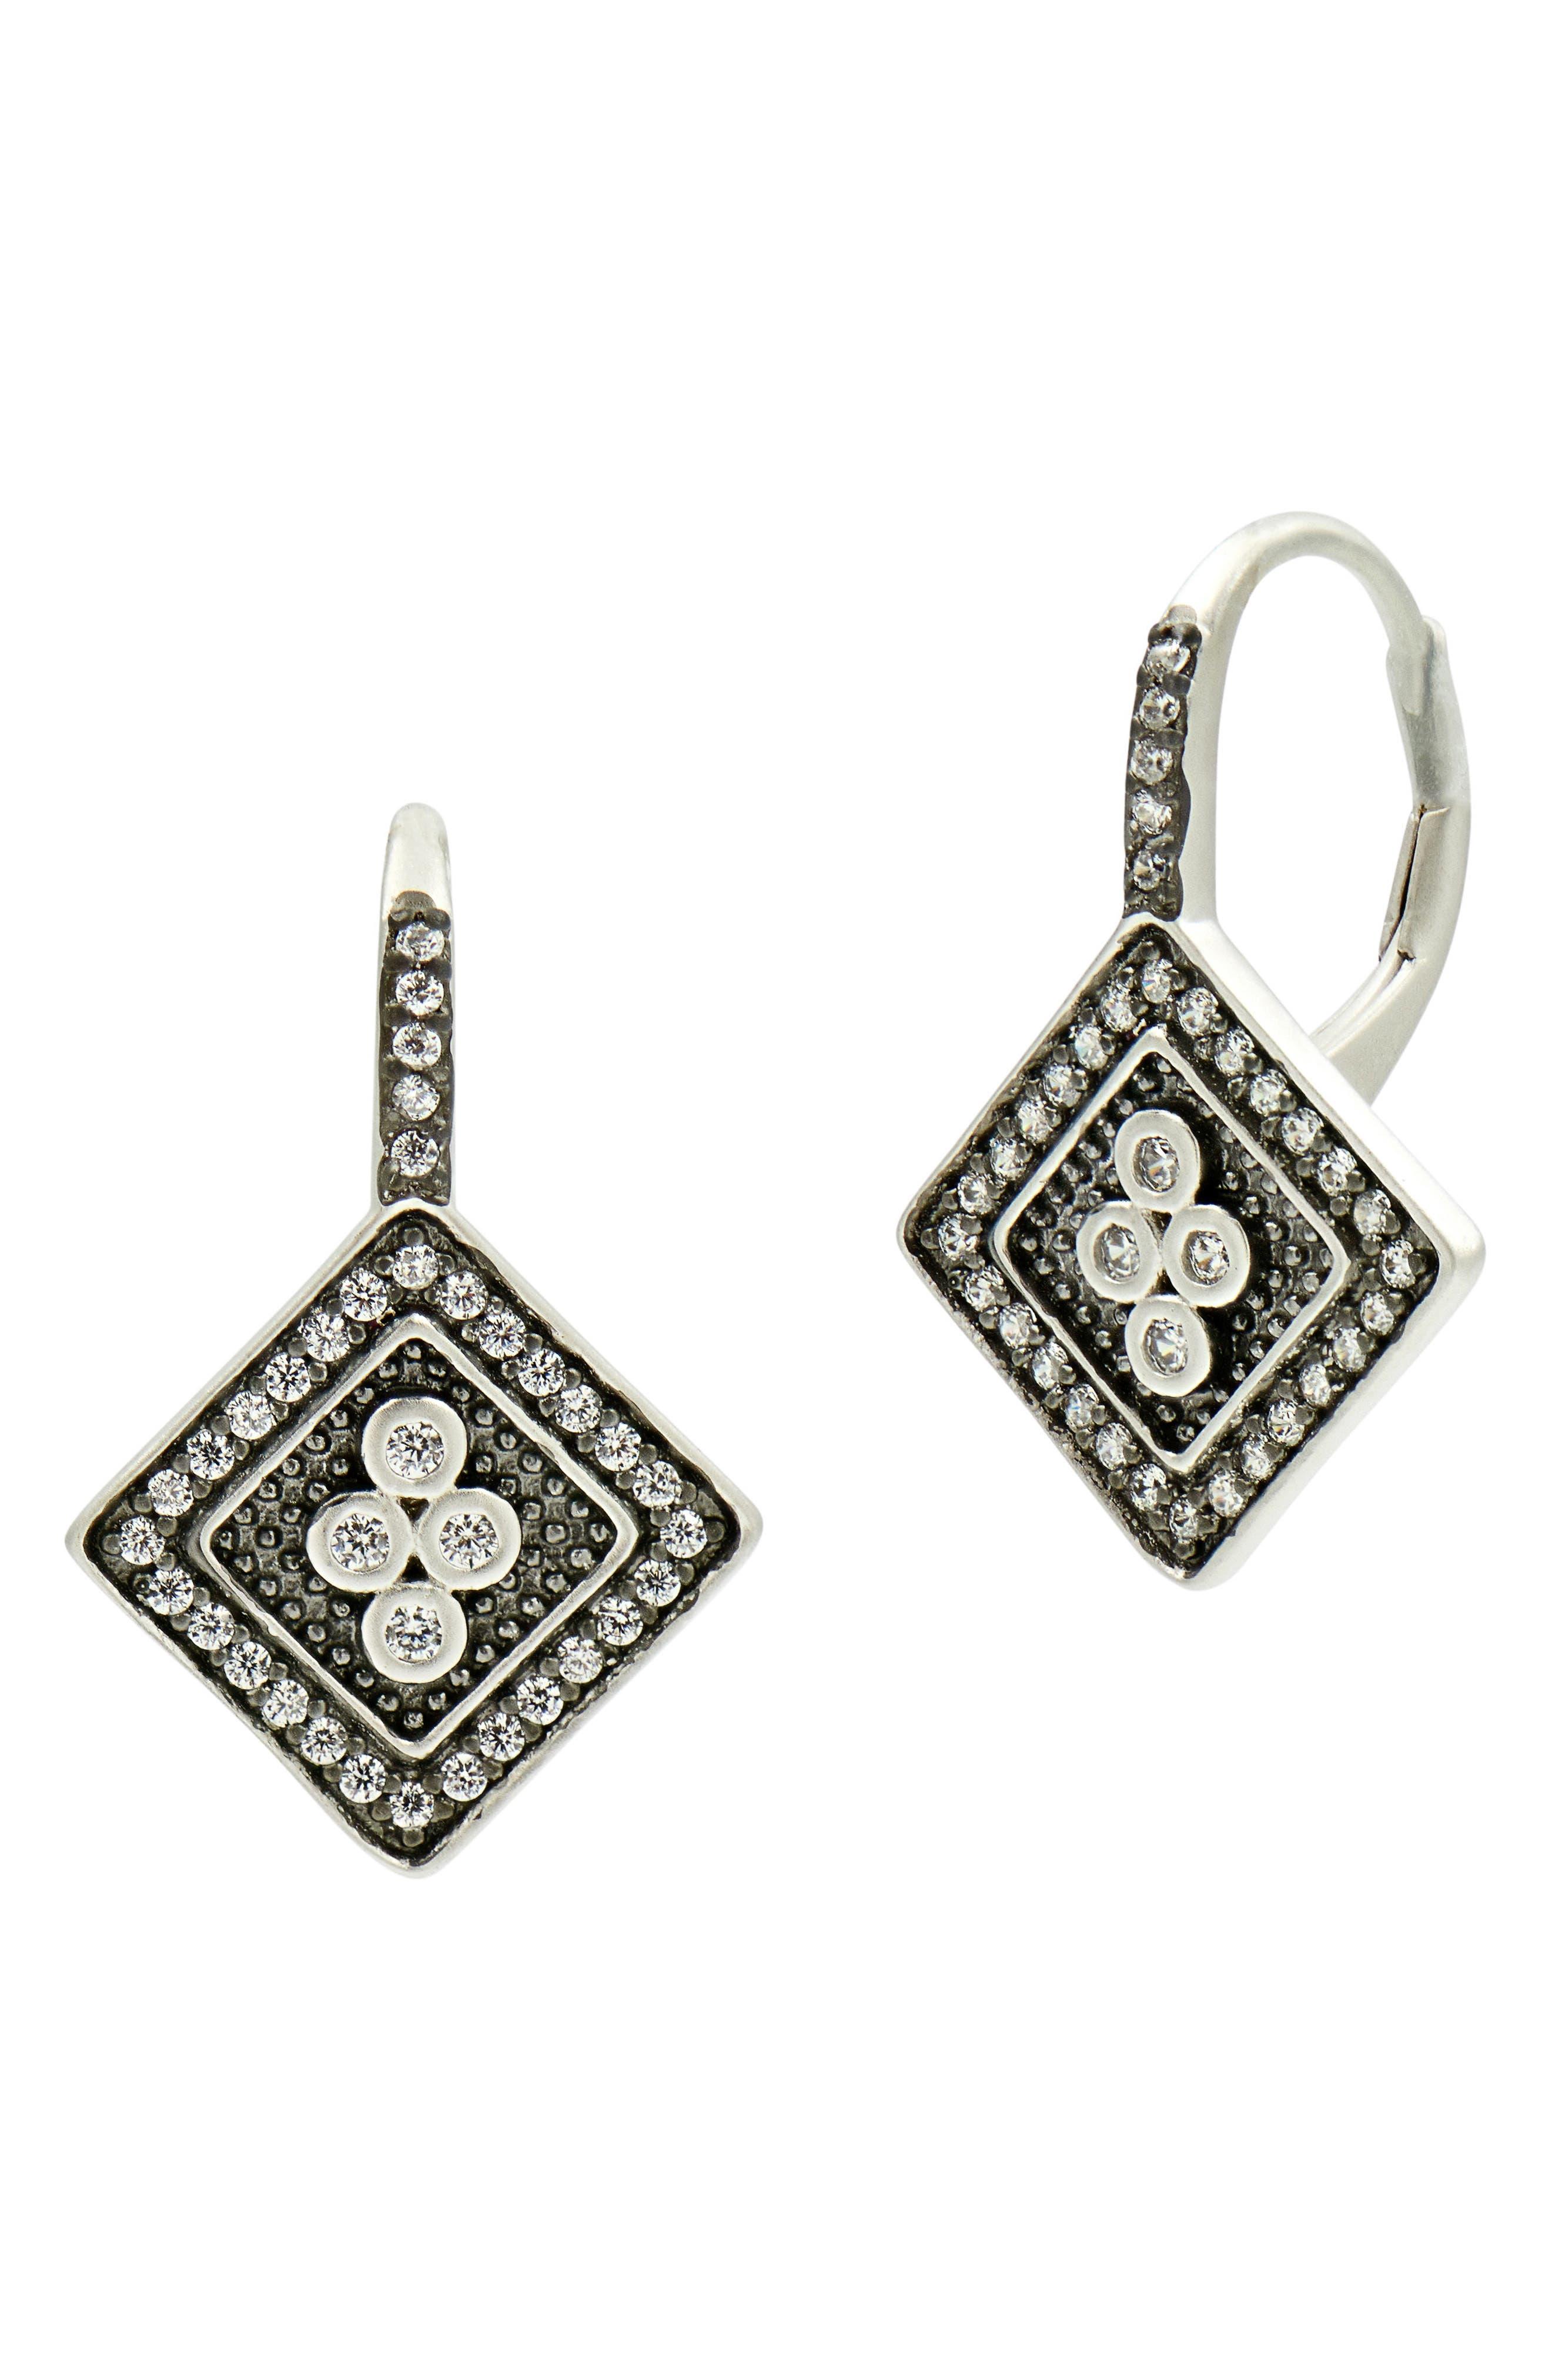 Industrial Finish Cubic Zirconia Drop Earrings,                         Main,                         color, BLACK/ SILVER